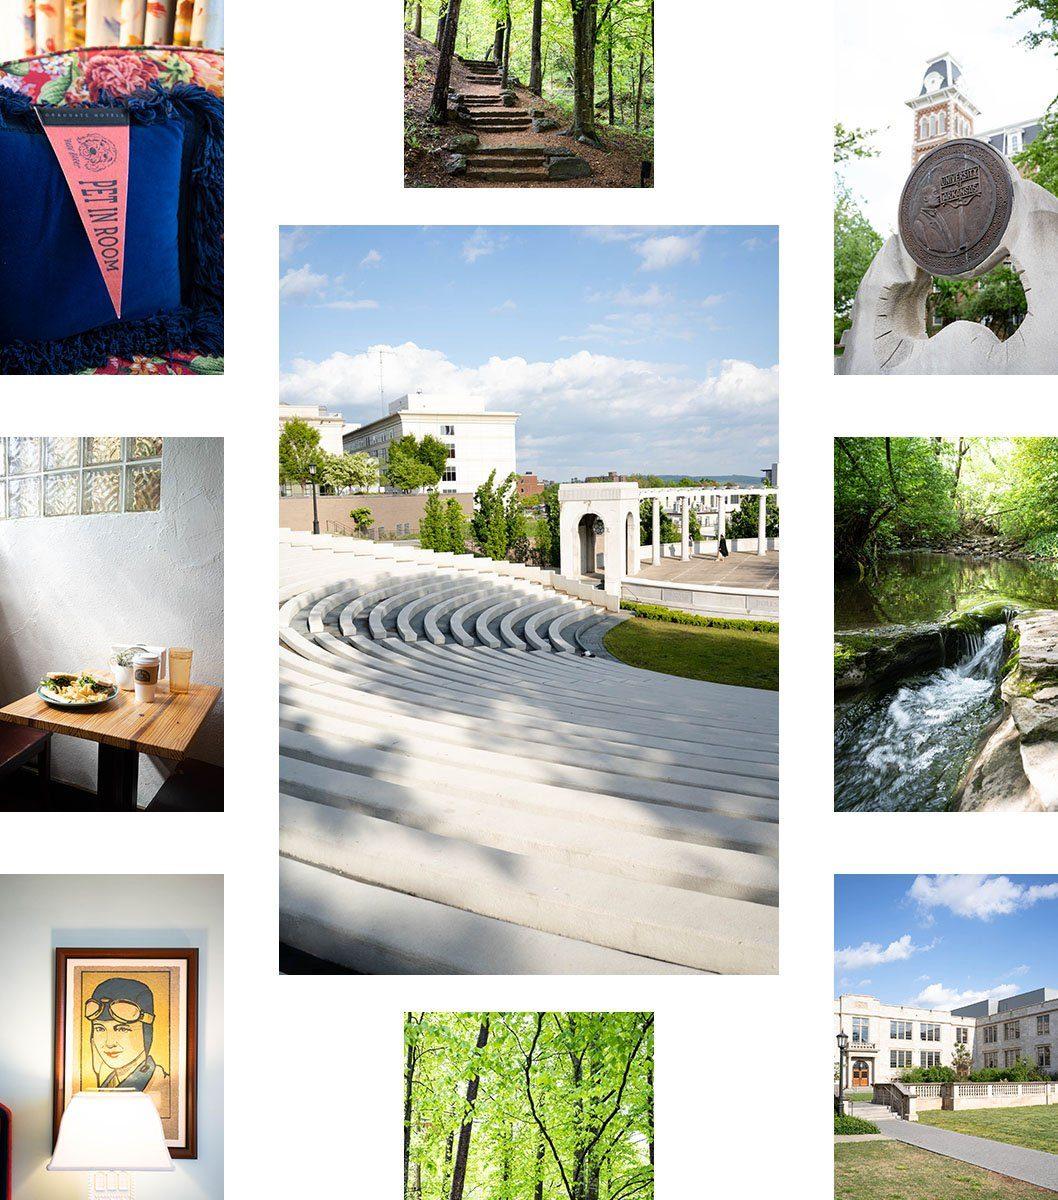 Collage of photos showcasing Fayetteville, Arkansas